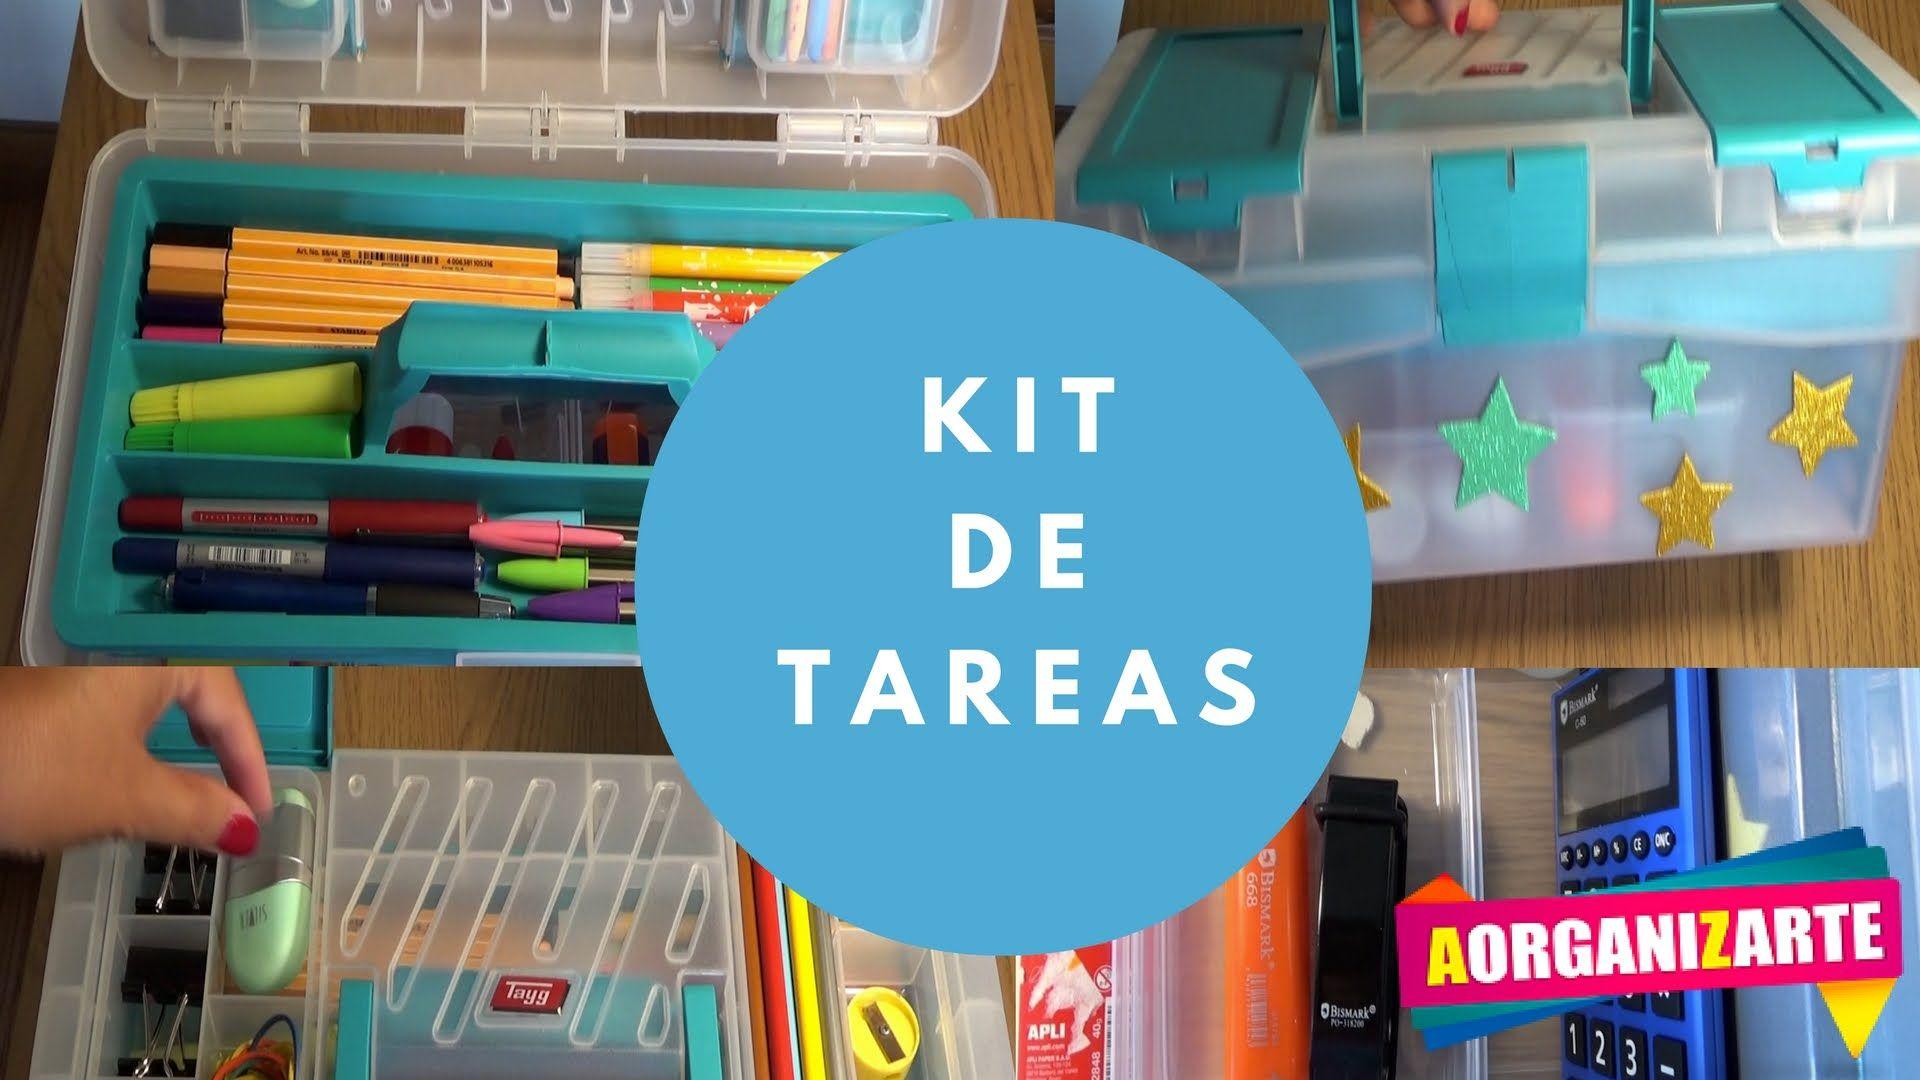 Kit de Tareas (AorganiZarte)